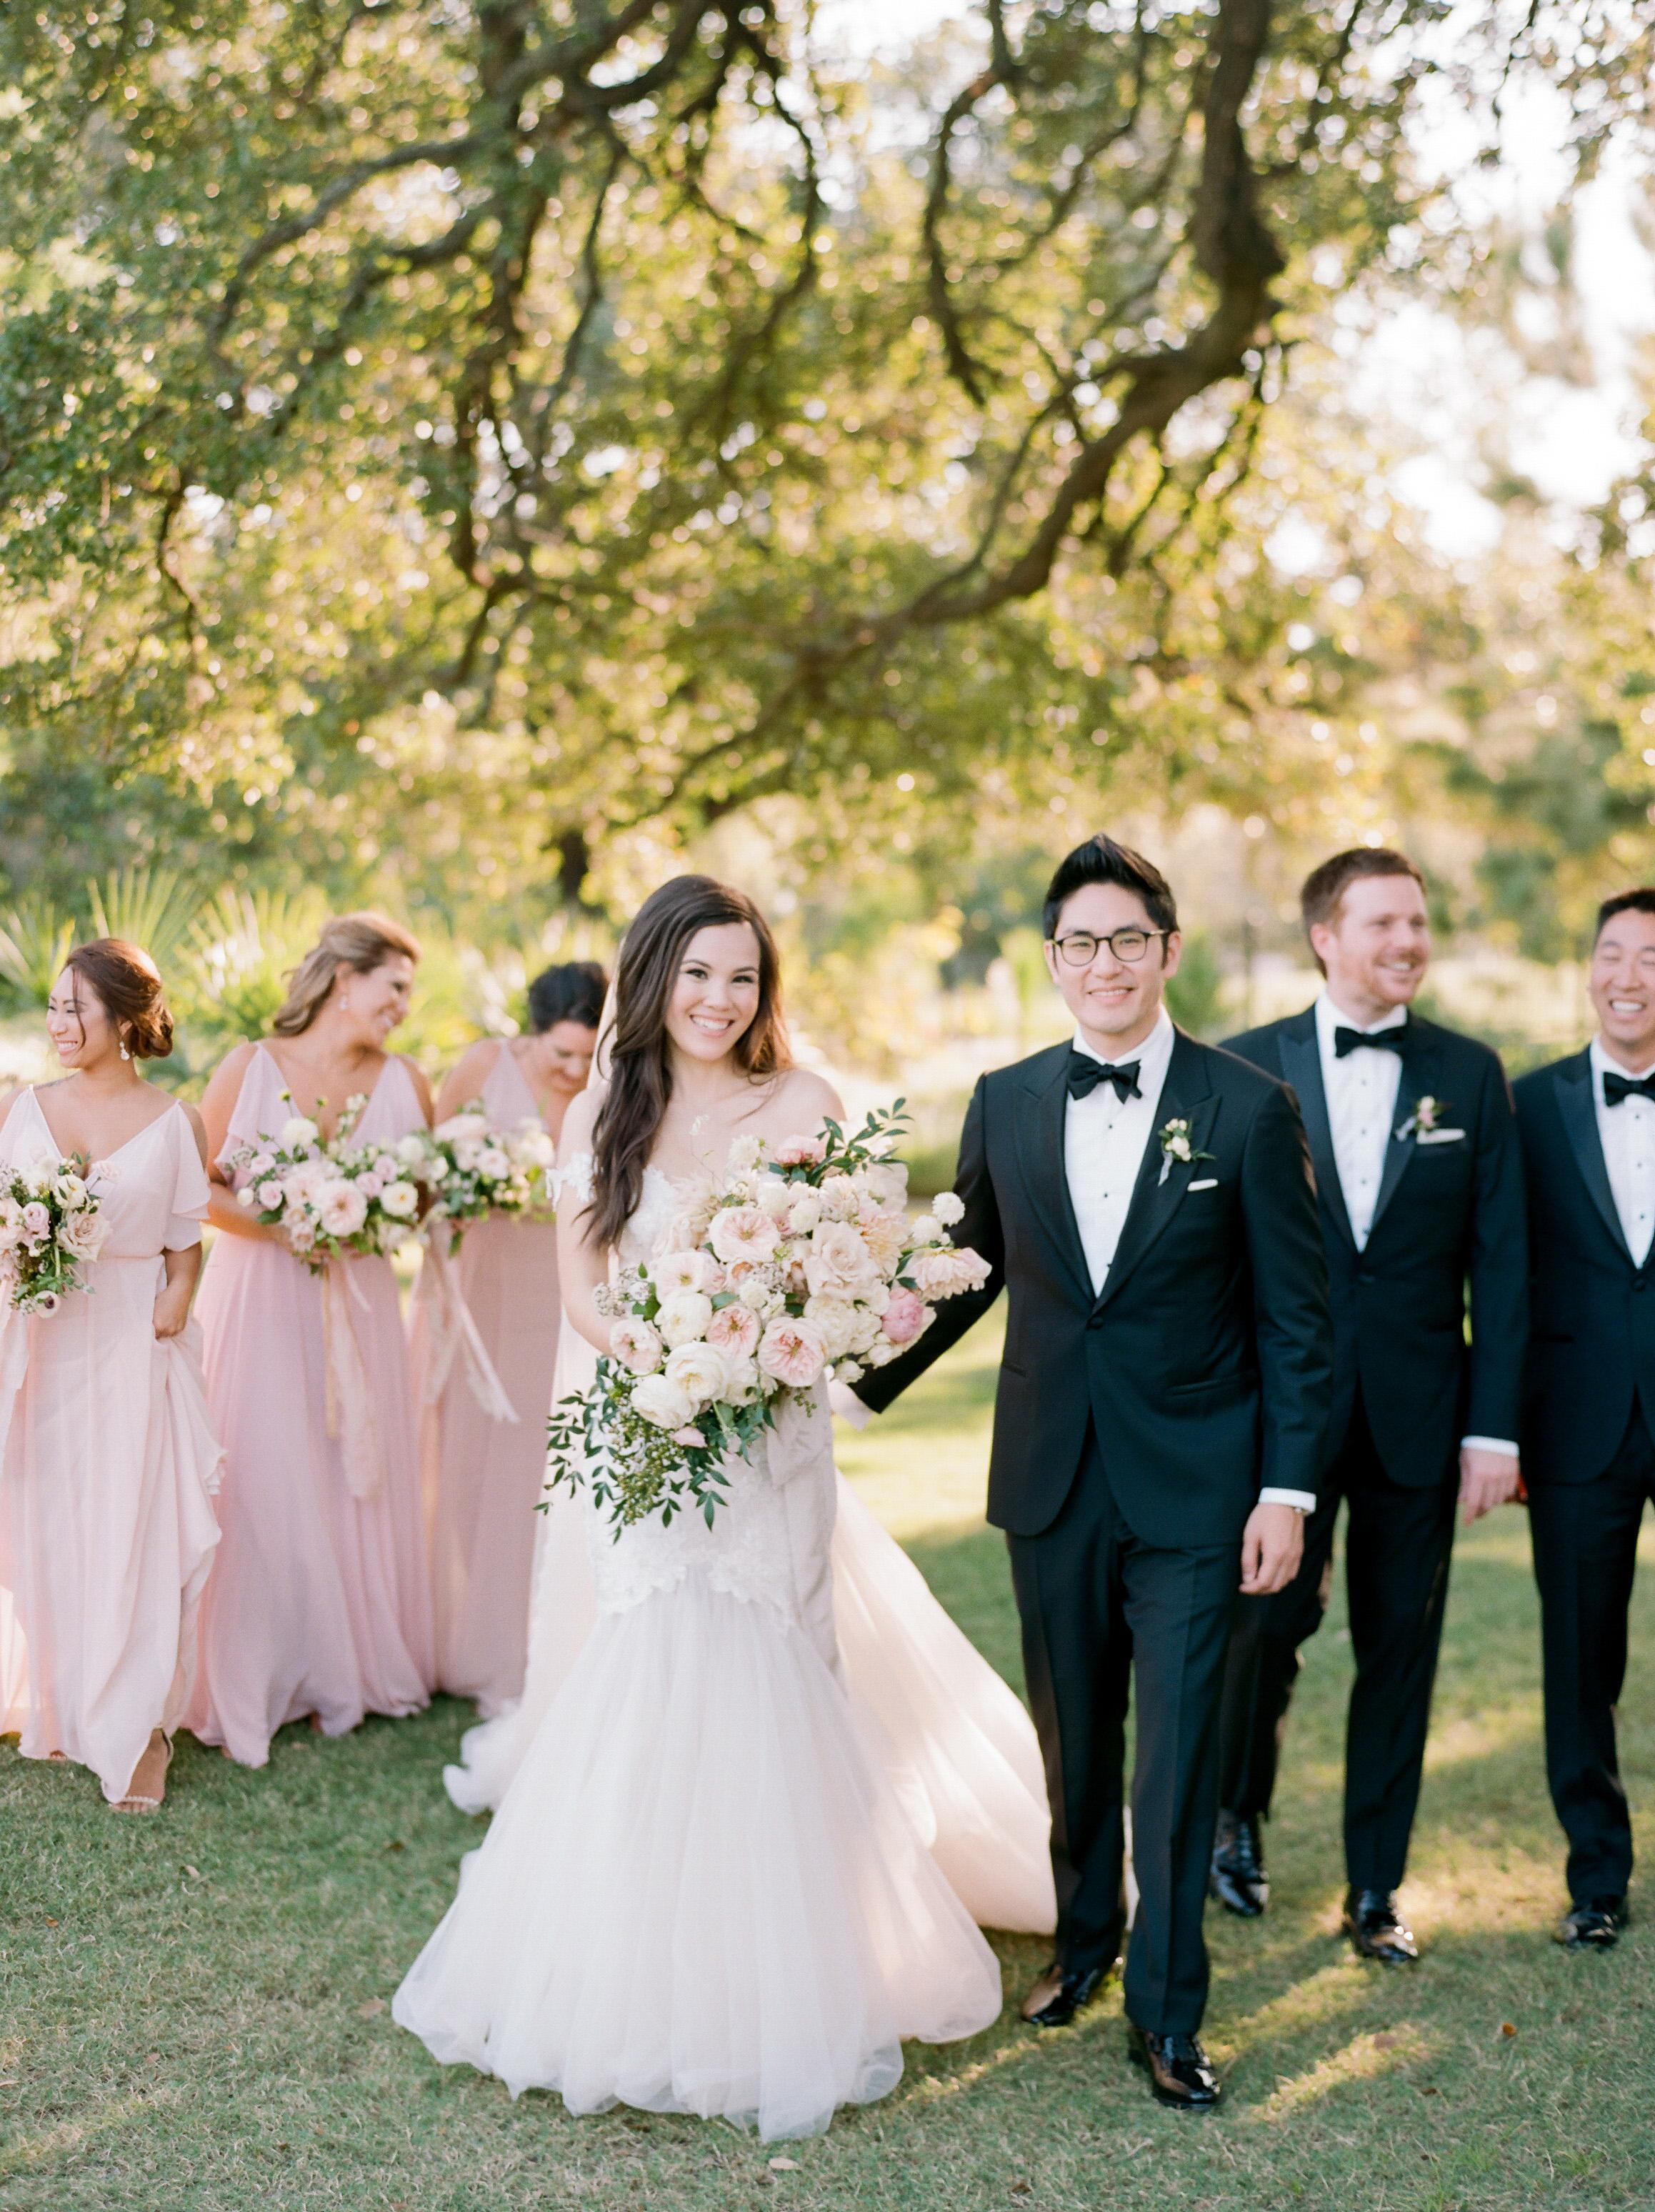 Martha-Stewart-Wedding-Dana-Fernandez-Photography-Josh-Texas-Film-Houston-Wedding-Fine-Art-Photographer-McGovern-Centennial-Gardens-Top-Best-23.jpg